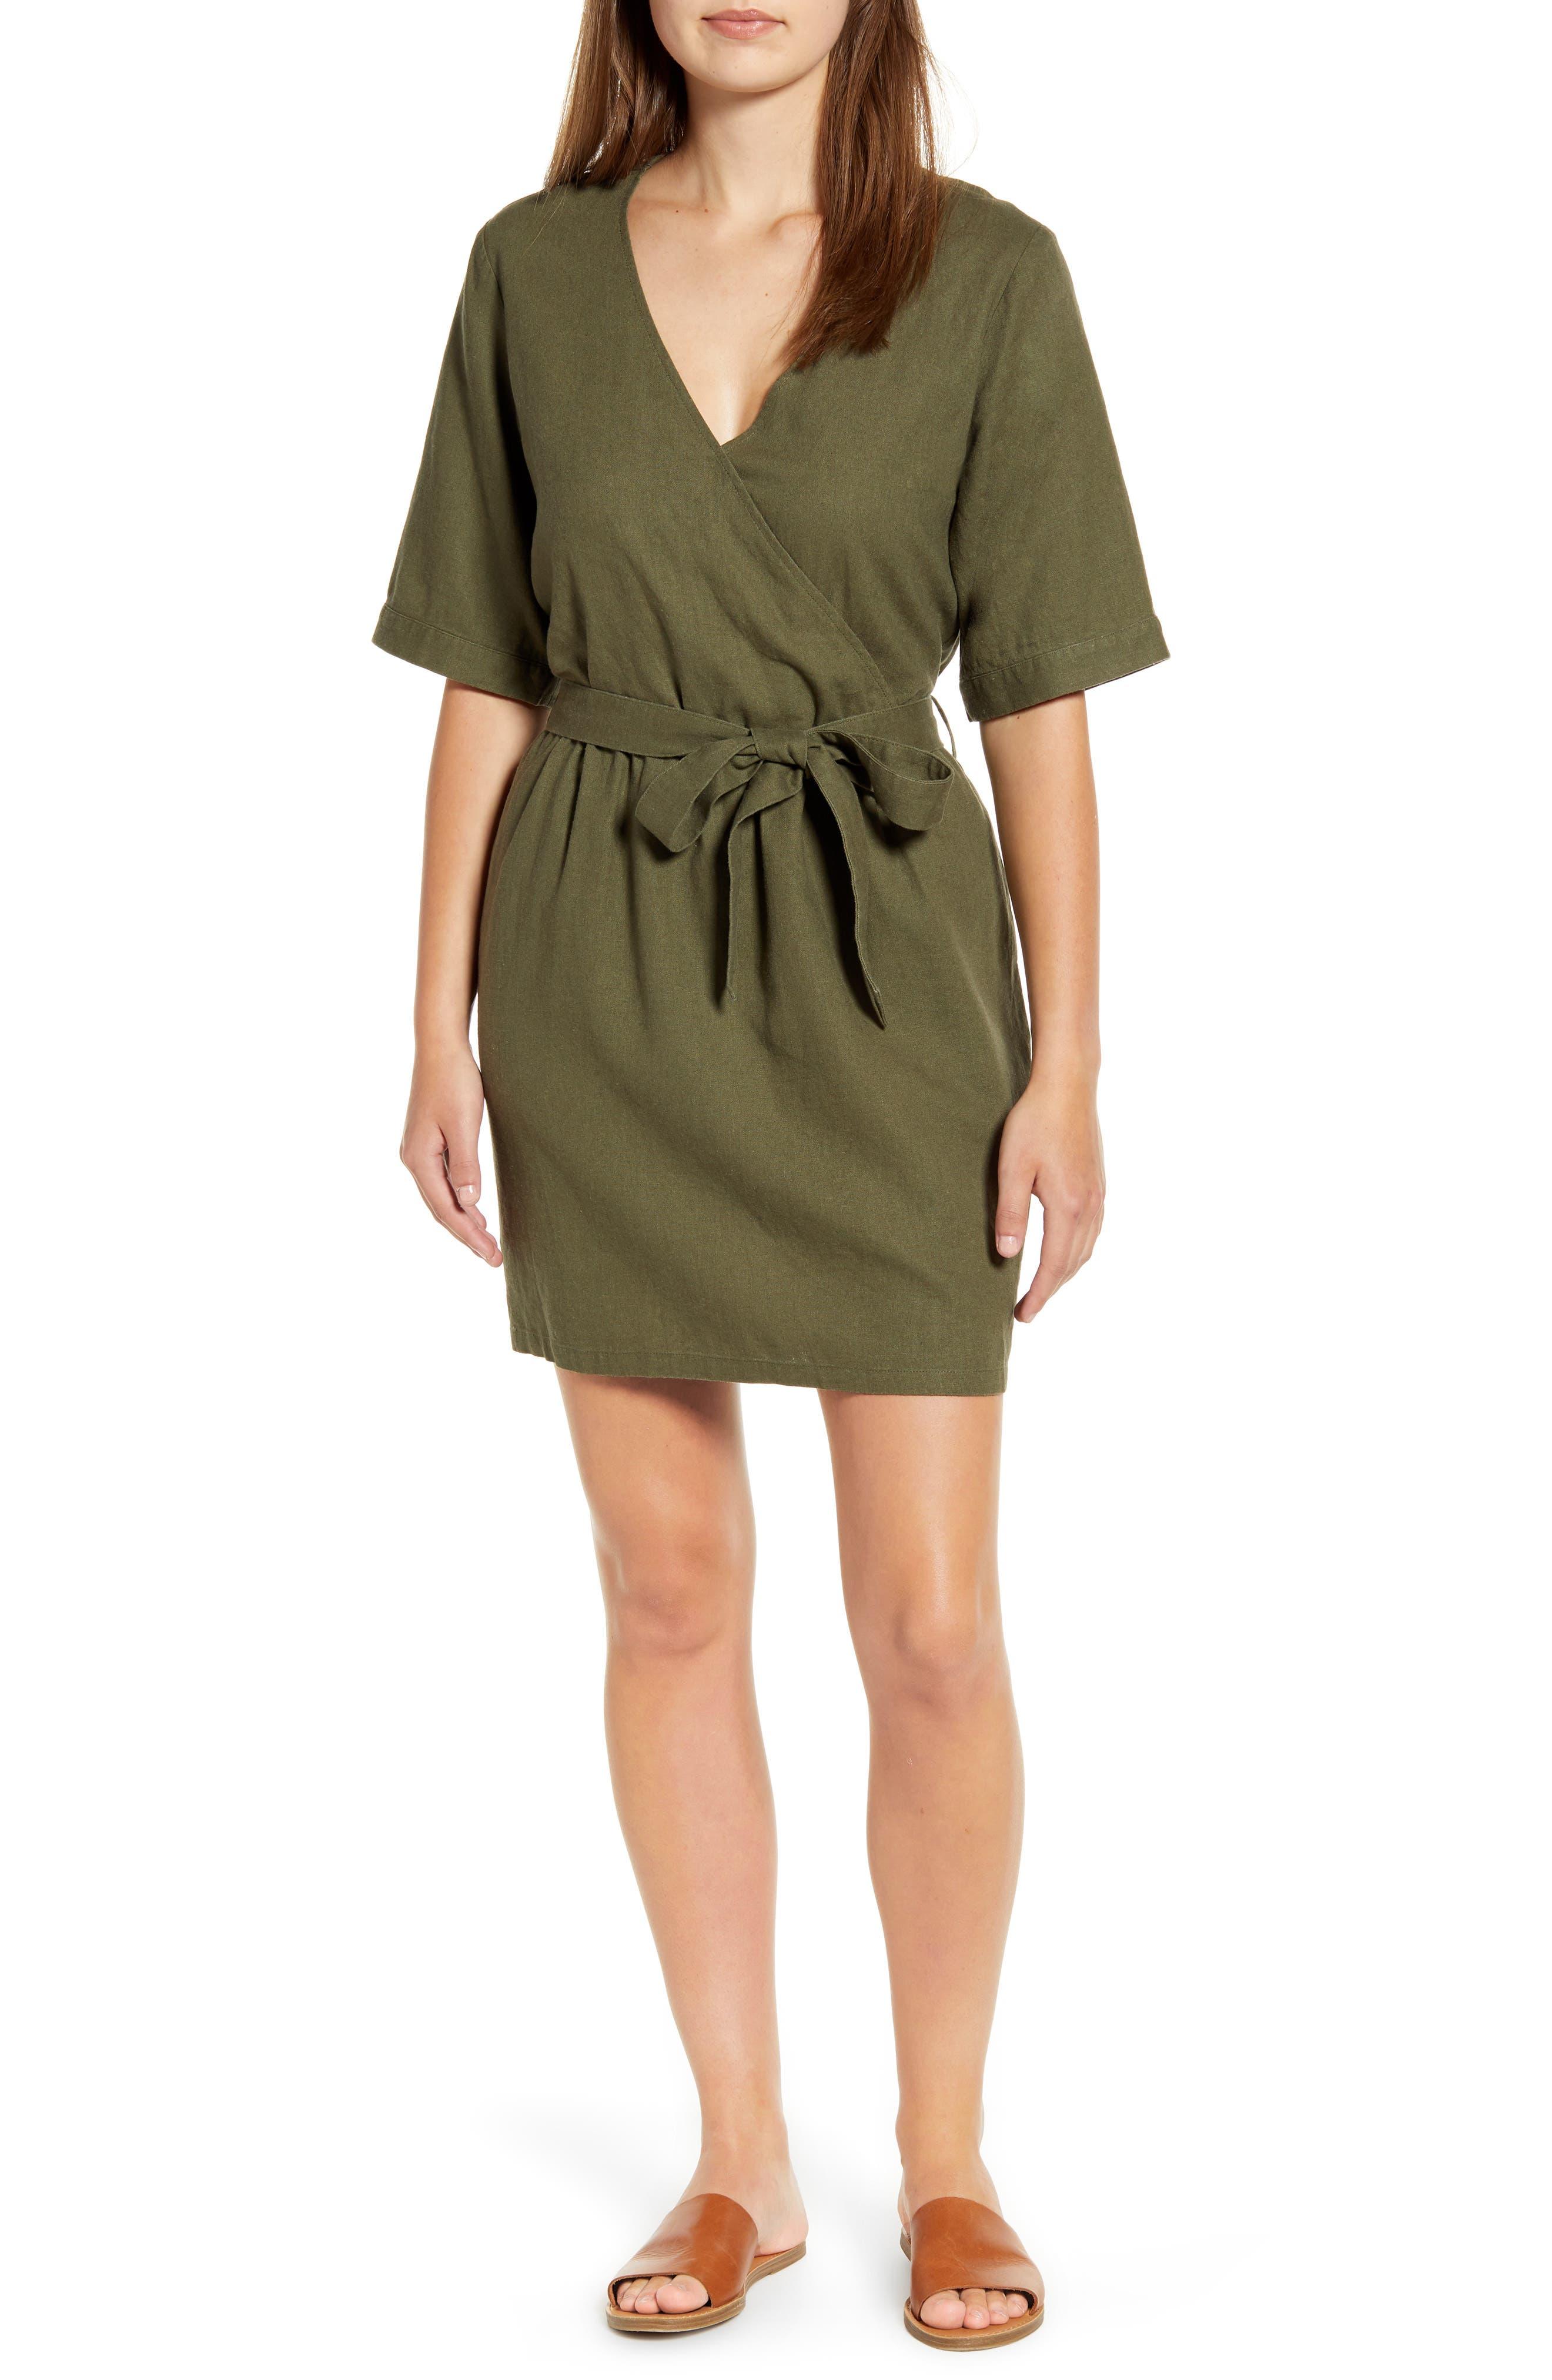 Petite Caslon Linen Blend Faux Wrap Dress, Green